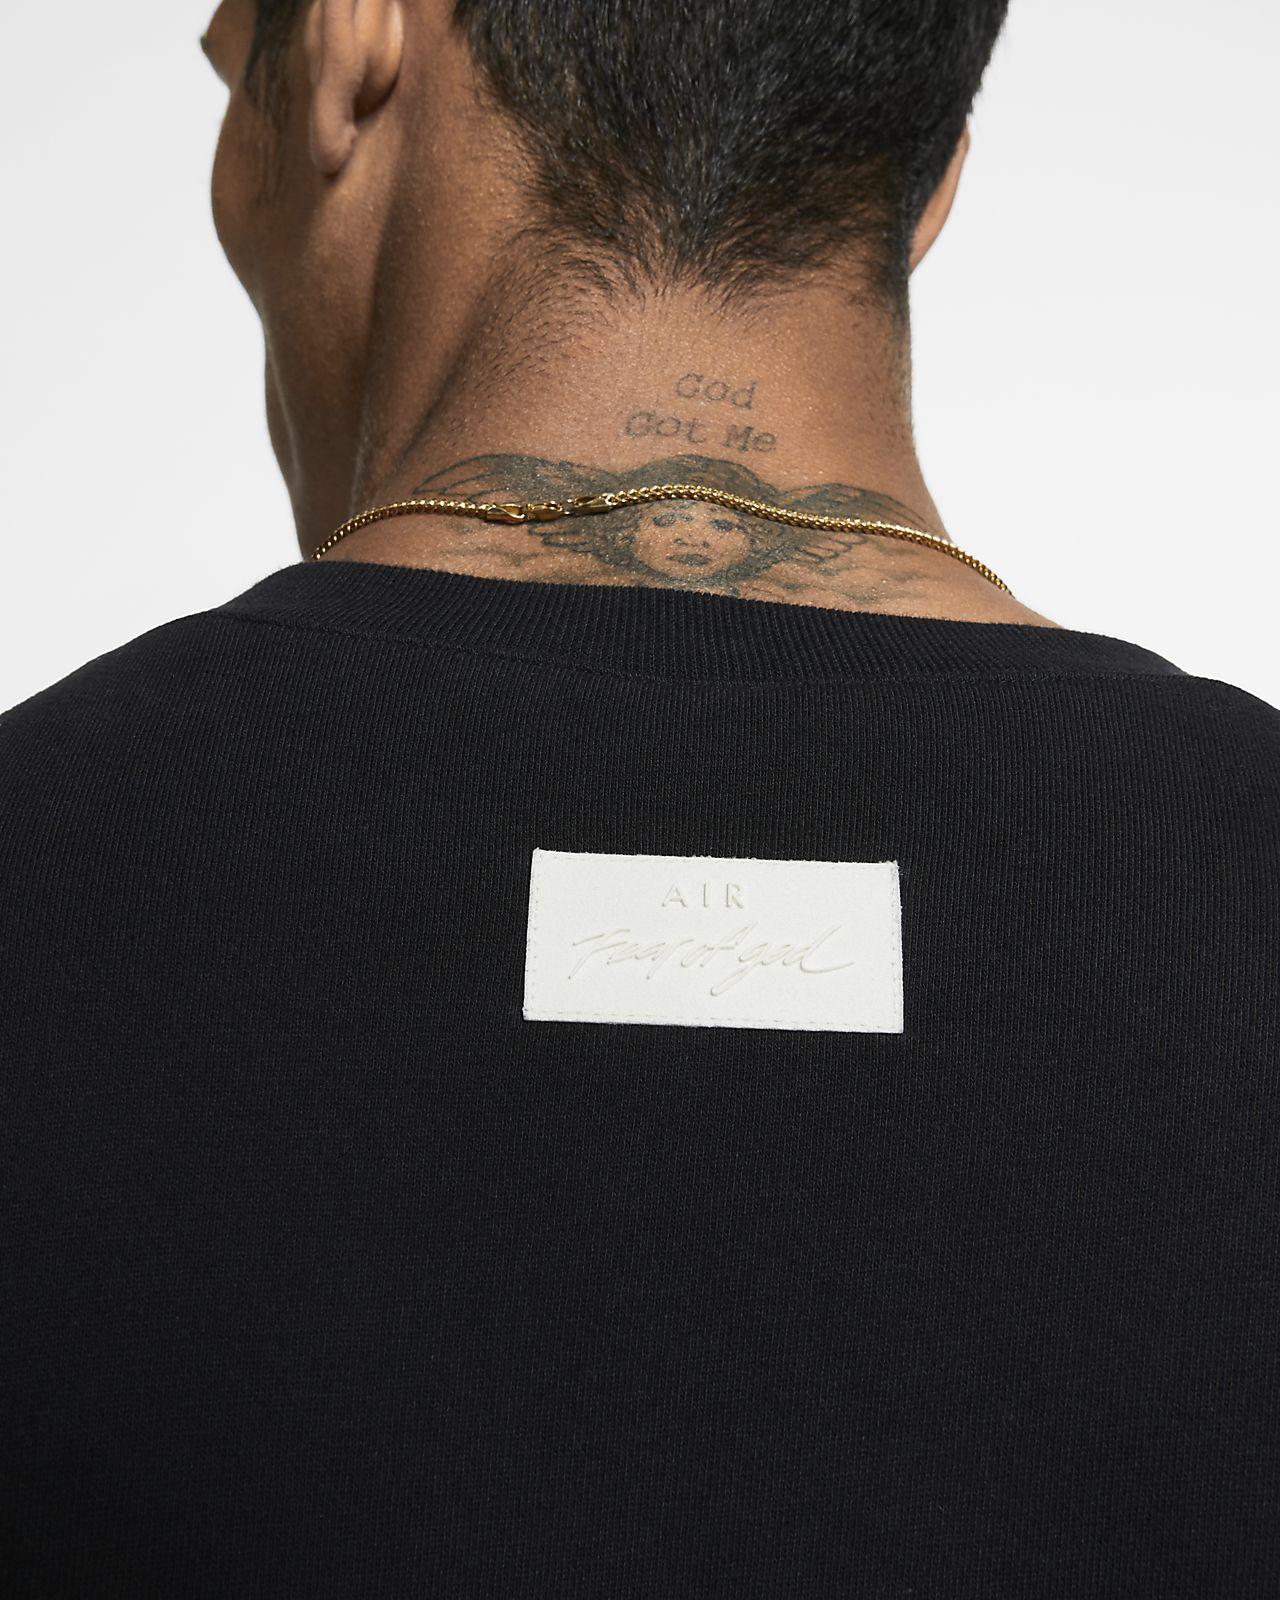 8ff033d1a4 Nike x Fear of God Chaqueta de calentamiento - Hombre. Nike.com ES